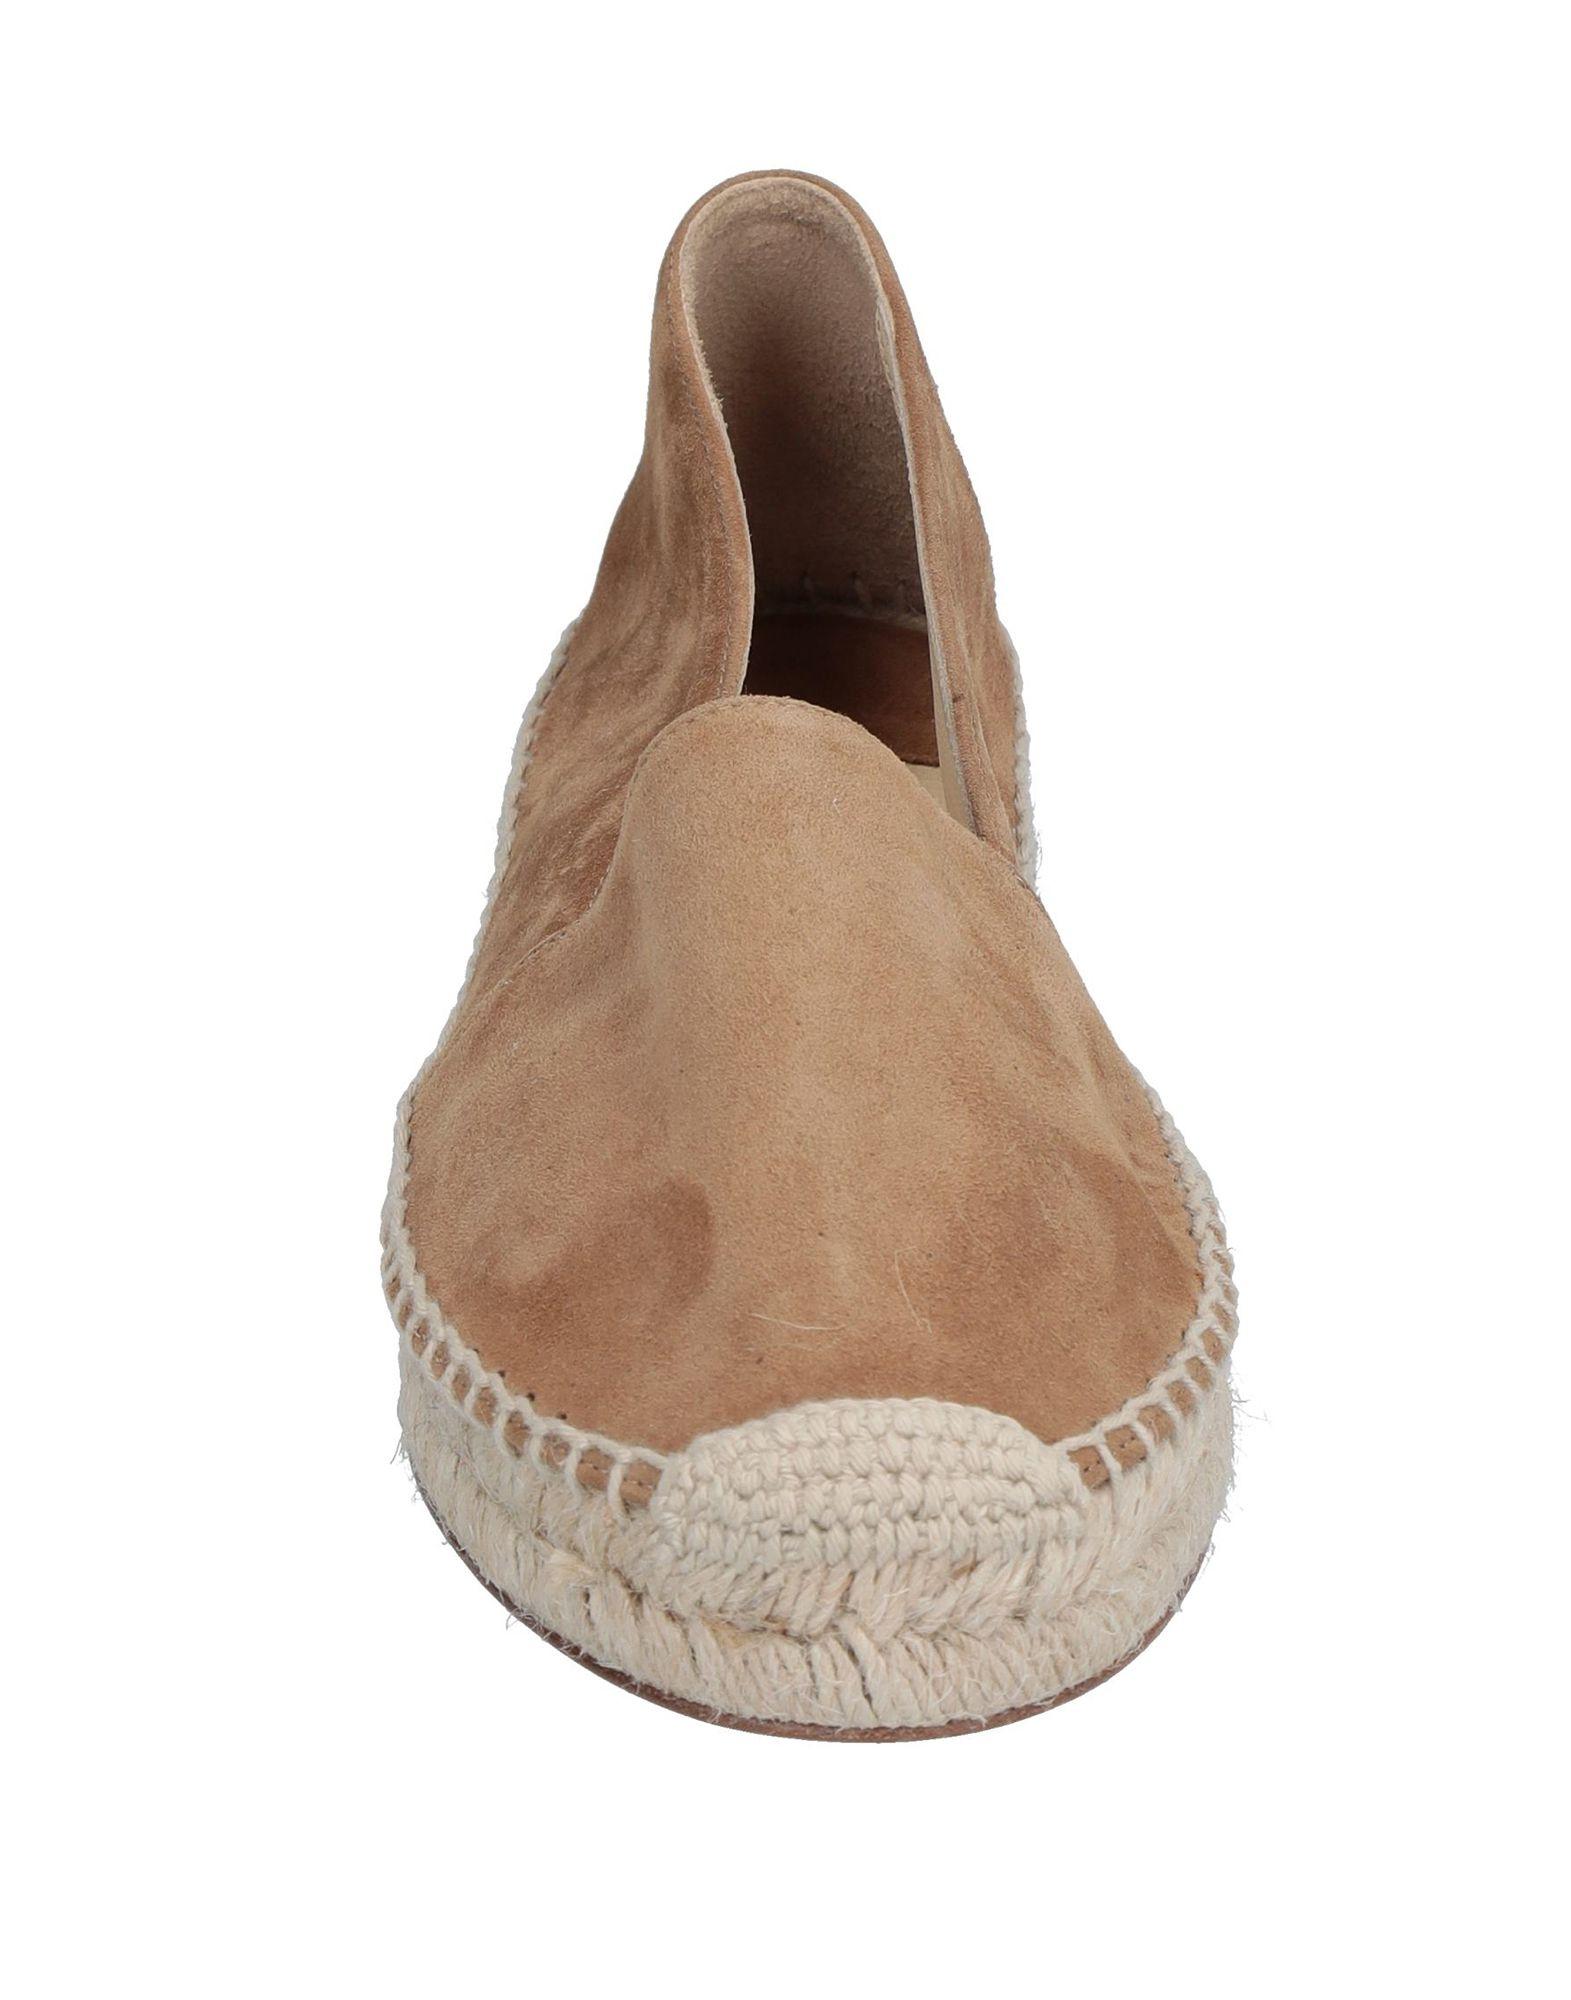 Paloma Barceló Espadrilles Espadrilles Espadrilles Damen  11538259IG Neue Schuhe 2f2493